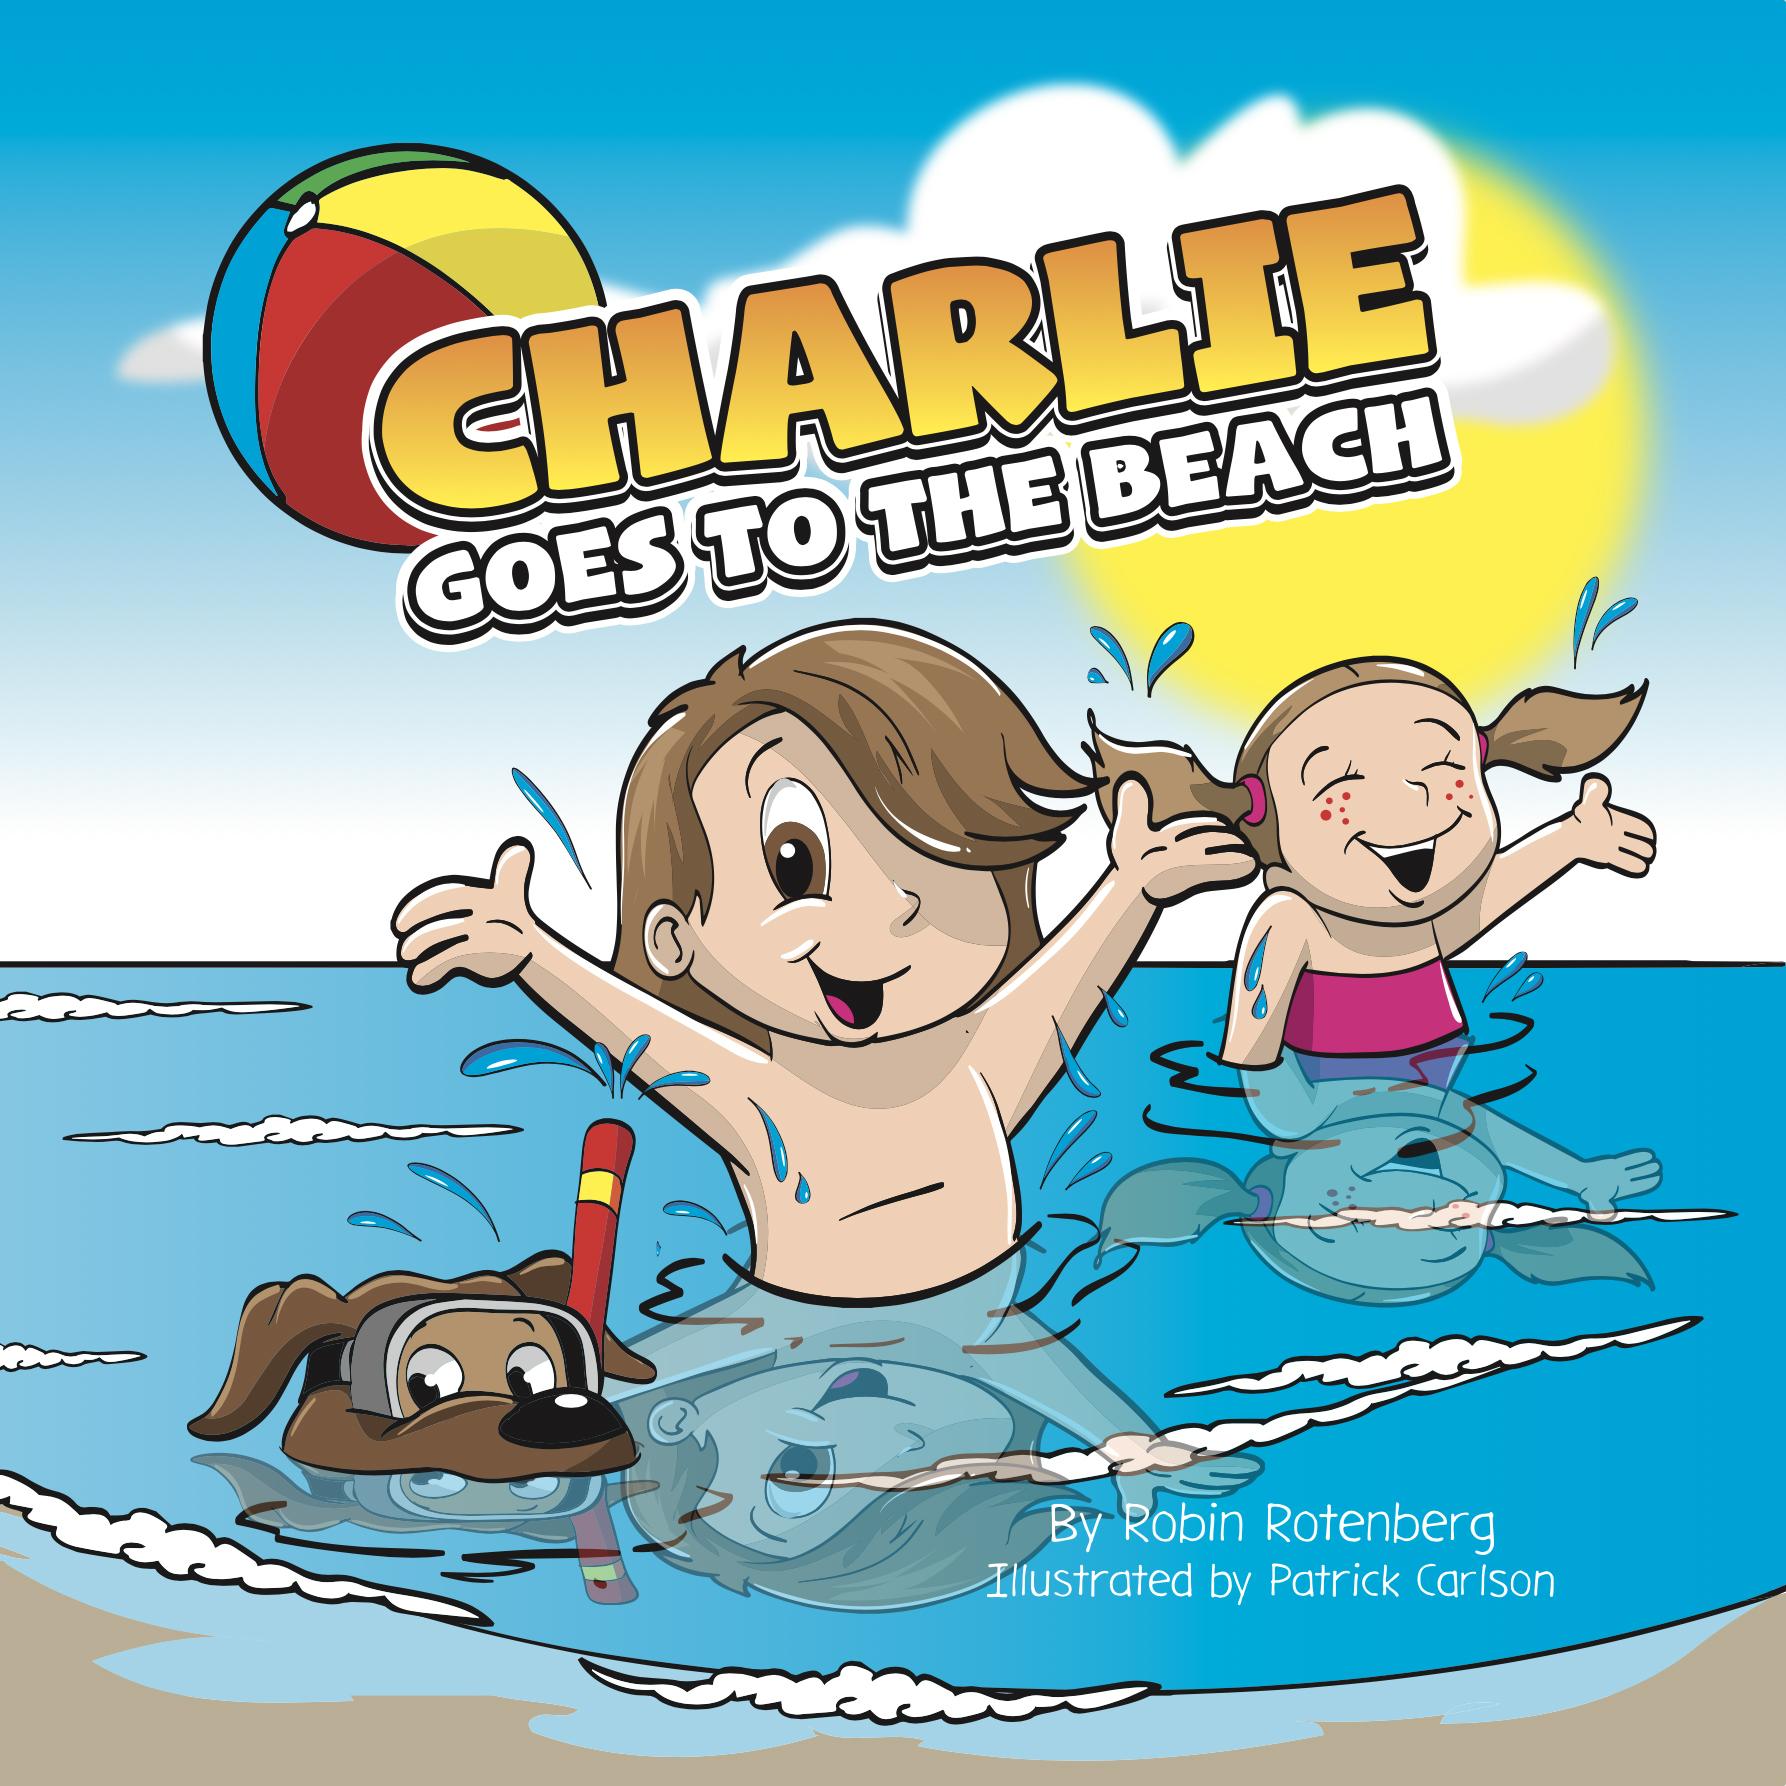 CharlieGoesToTheBeach_CoverImage